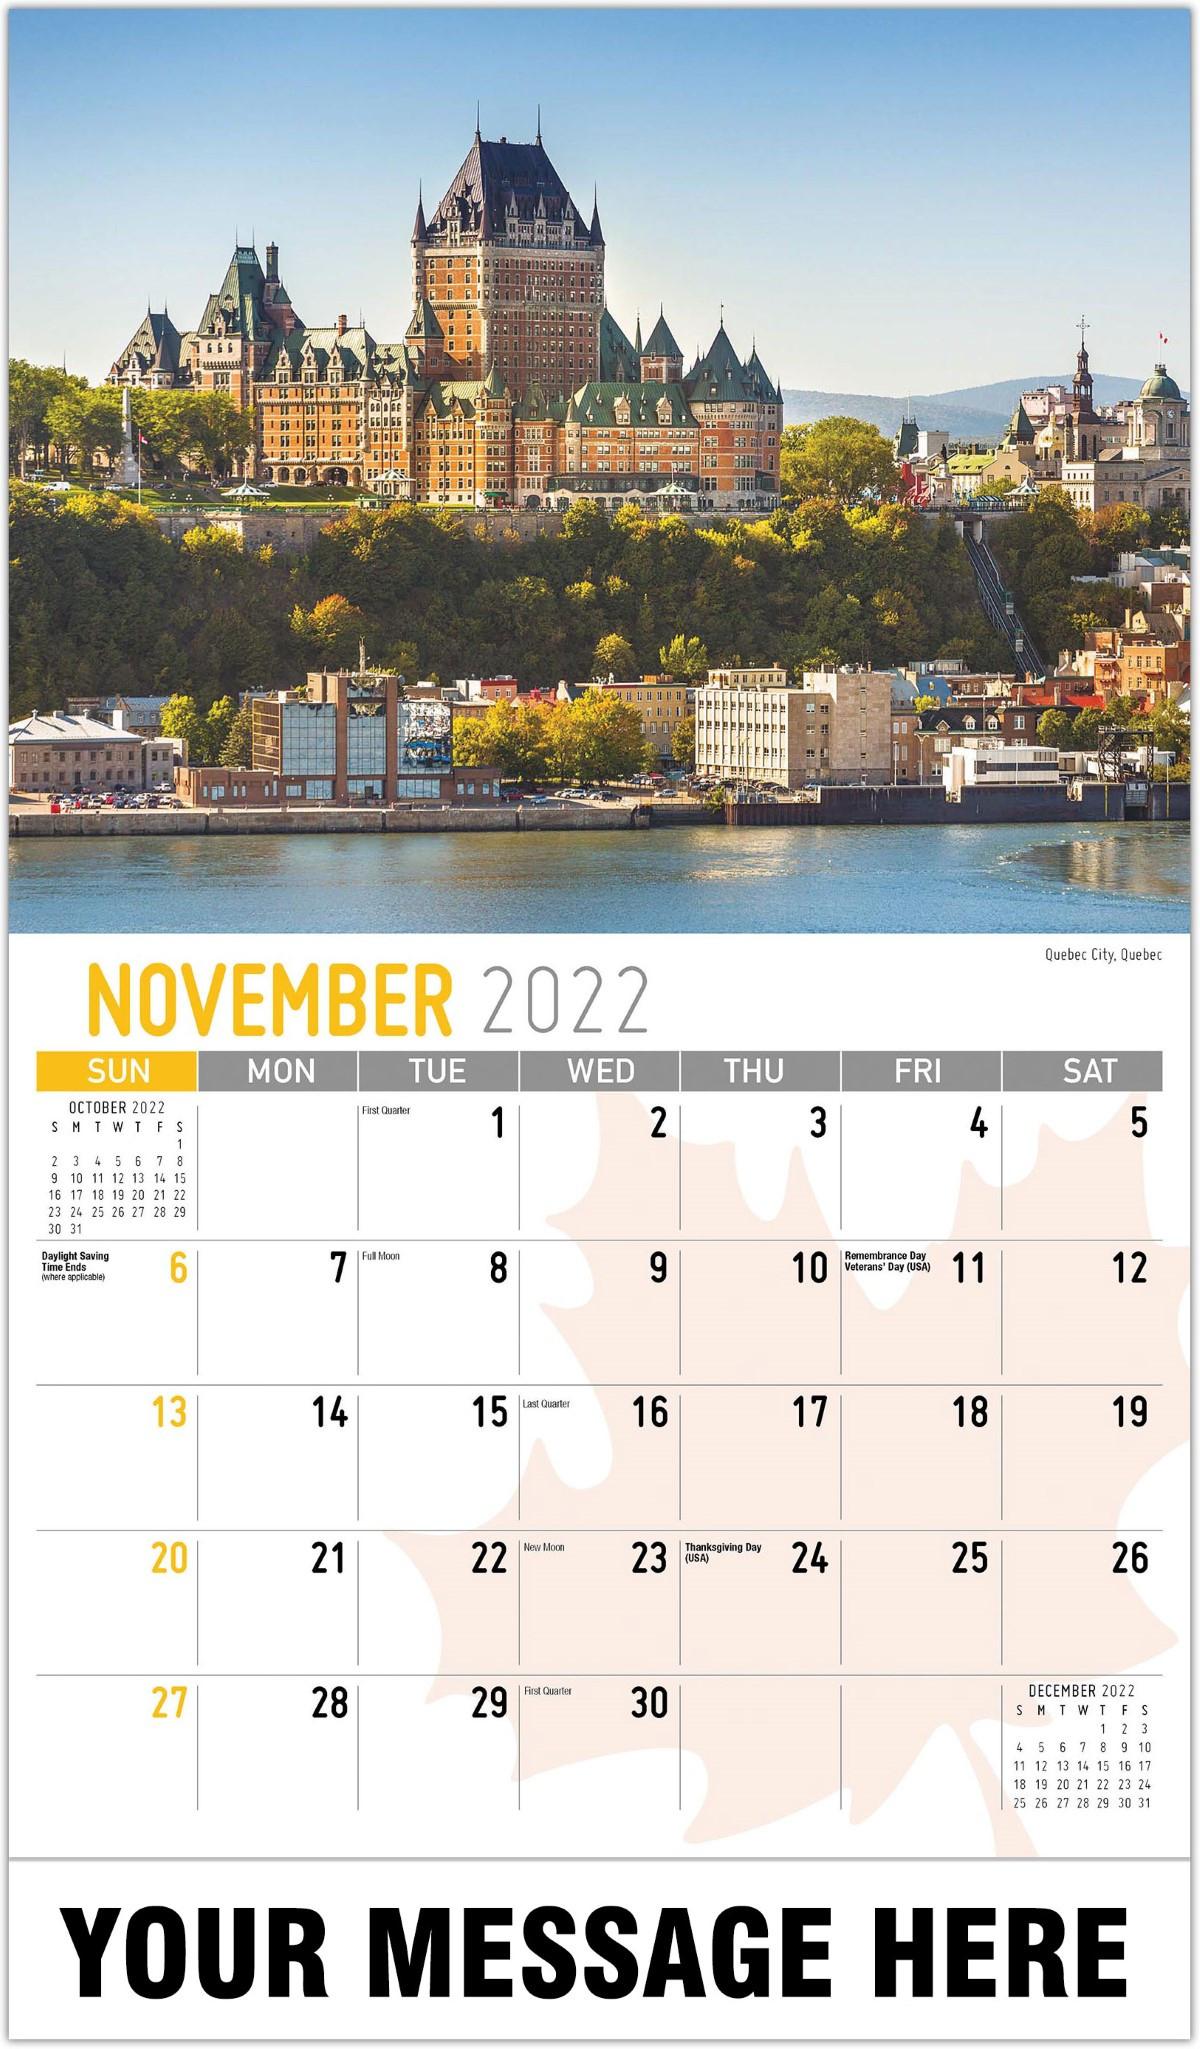 Scenes Of Canada - 2022 Promotional Calendar